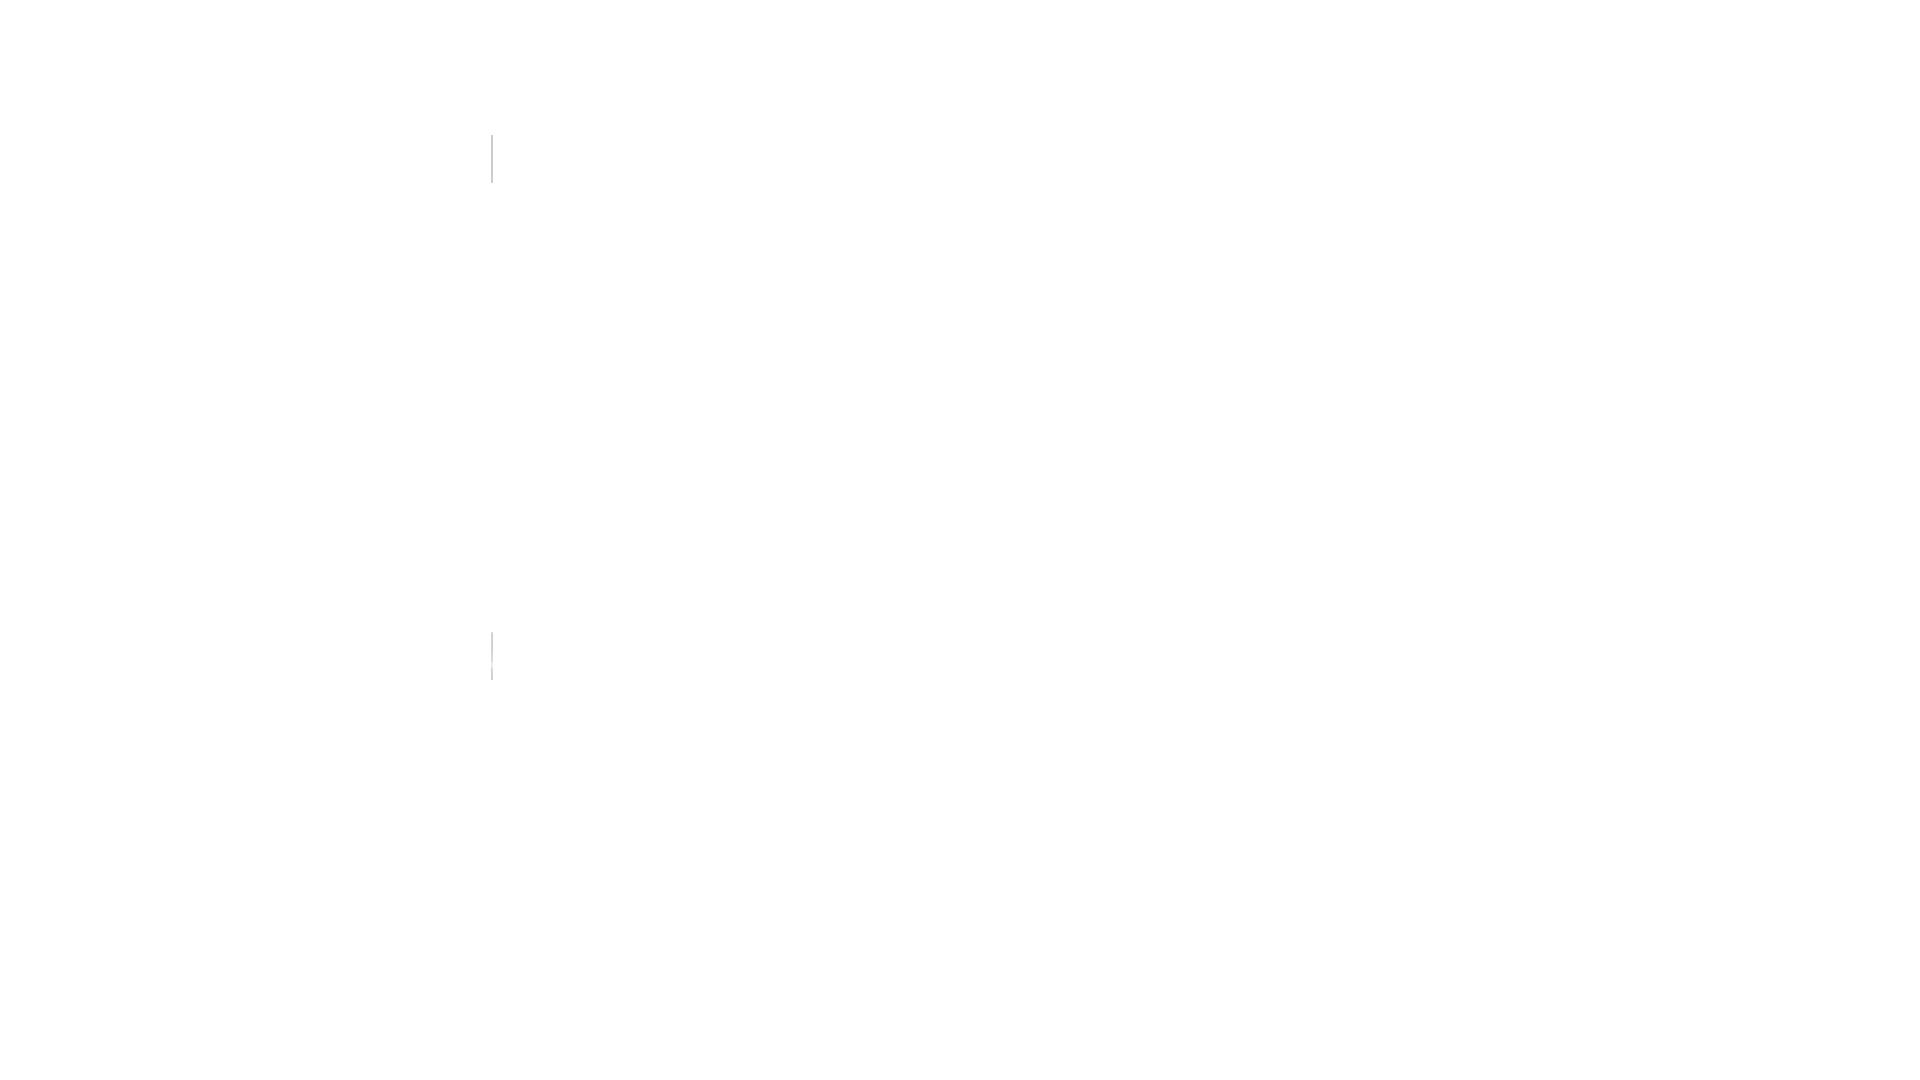 63rd Street-06.png